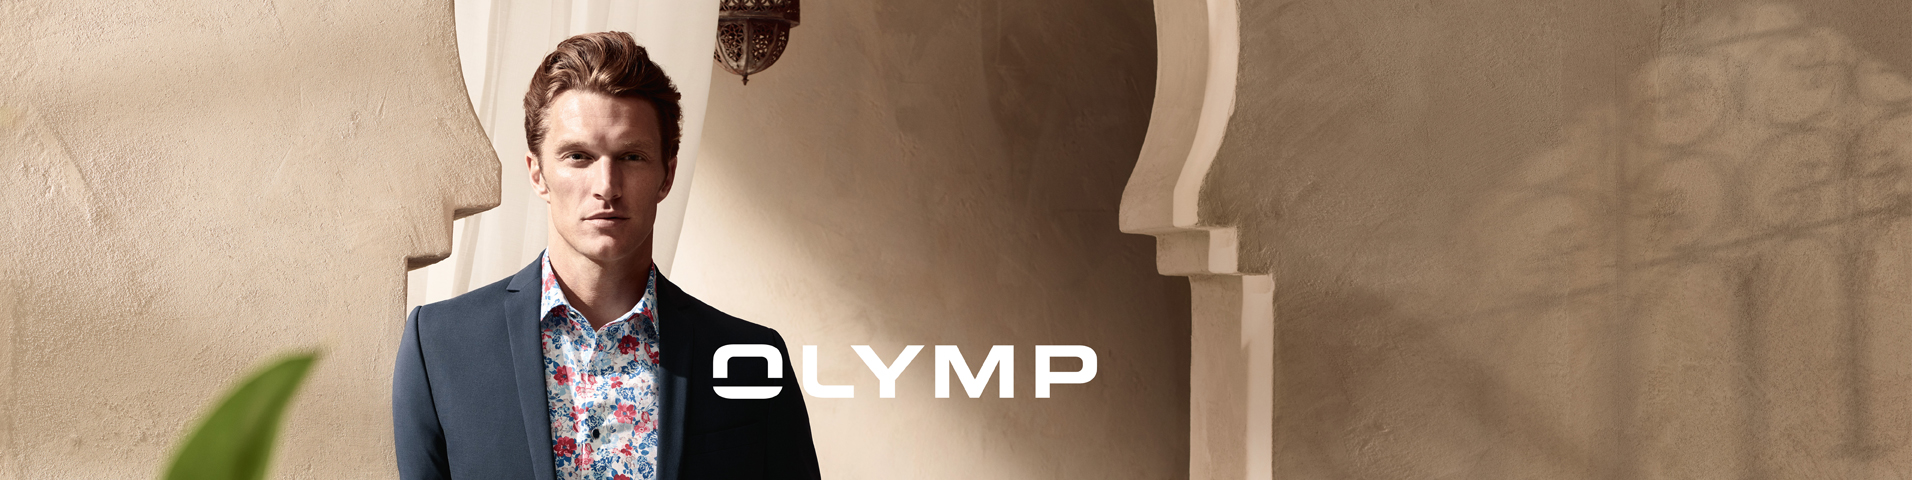 OLYMP Luxor OLYMP LUXOR Chemise schwarz ZALANDO.FR